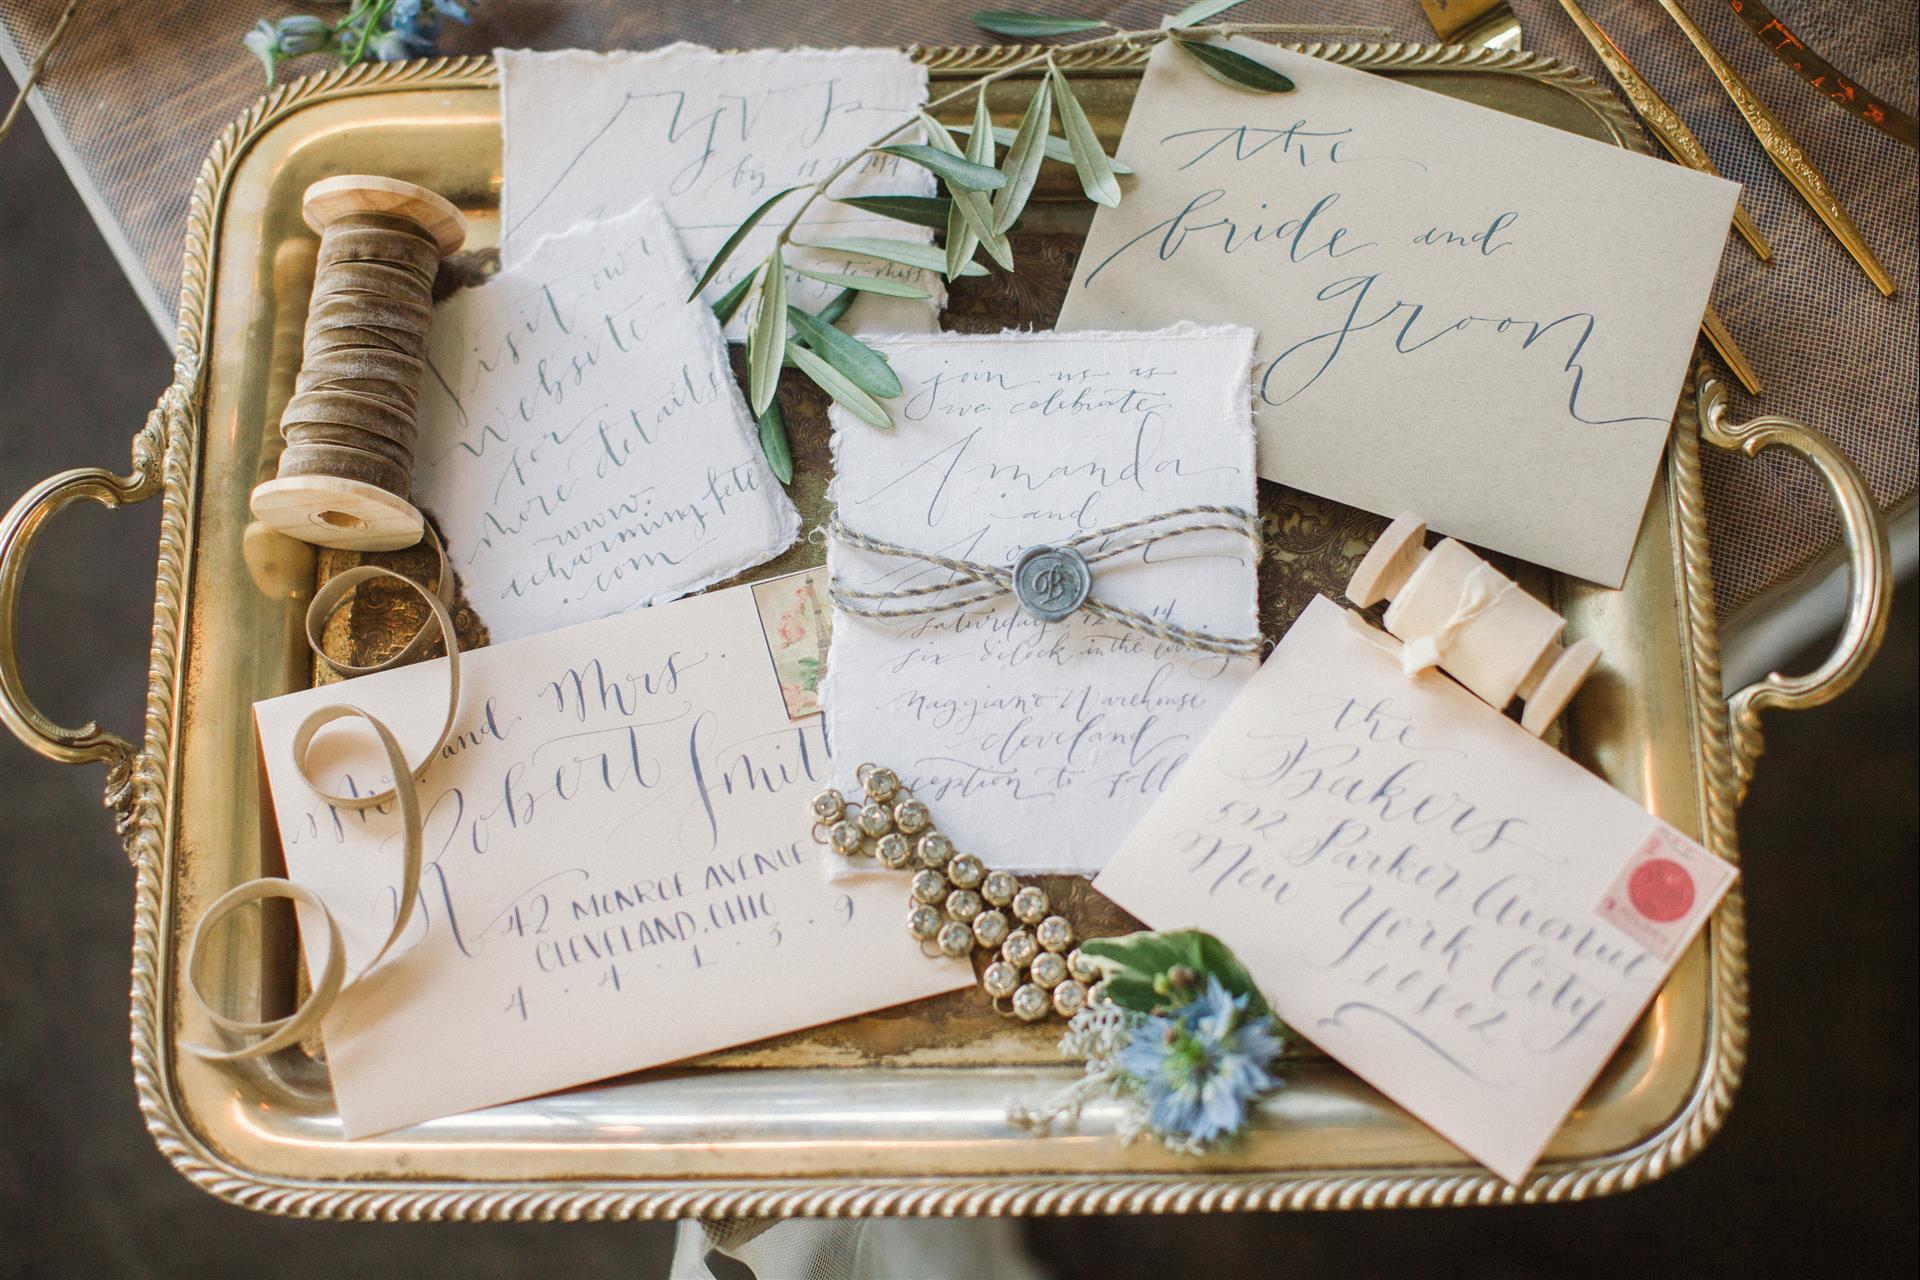 Feminine Wedding Inspiration by A Charming Fete | PartiesforPennies.com | Invitations, Paper, Handwritten, Wedding Invites